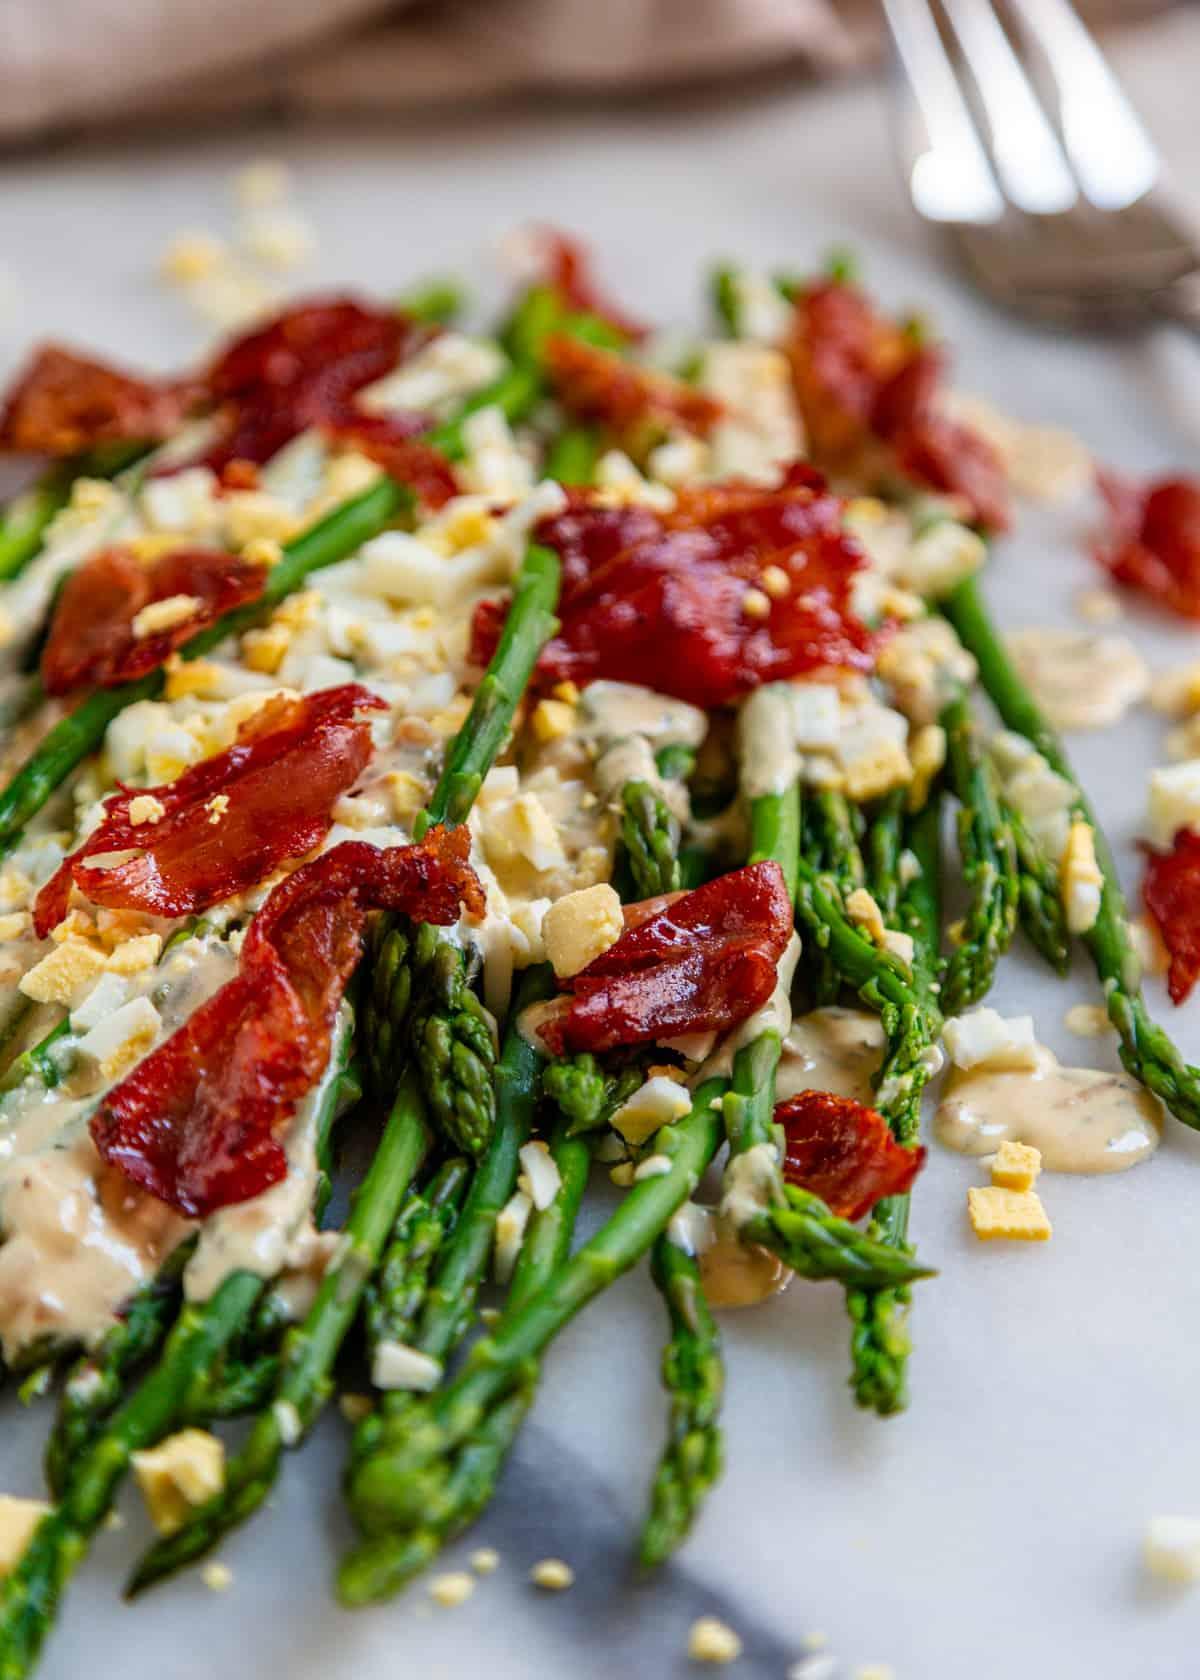 crispy prosciutto crumbled on asparagus with tarragon sauce